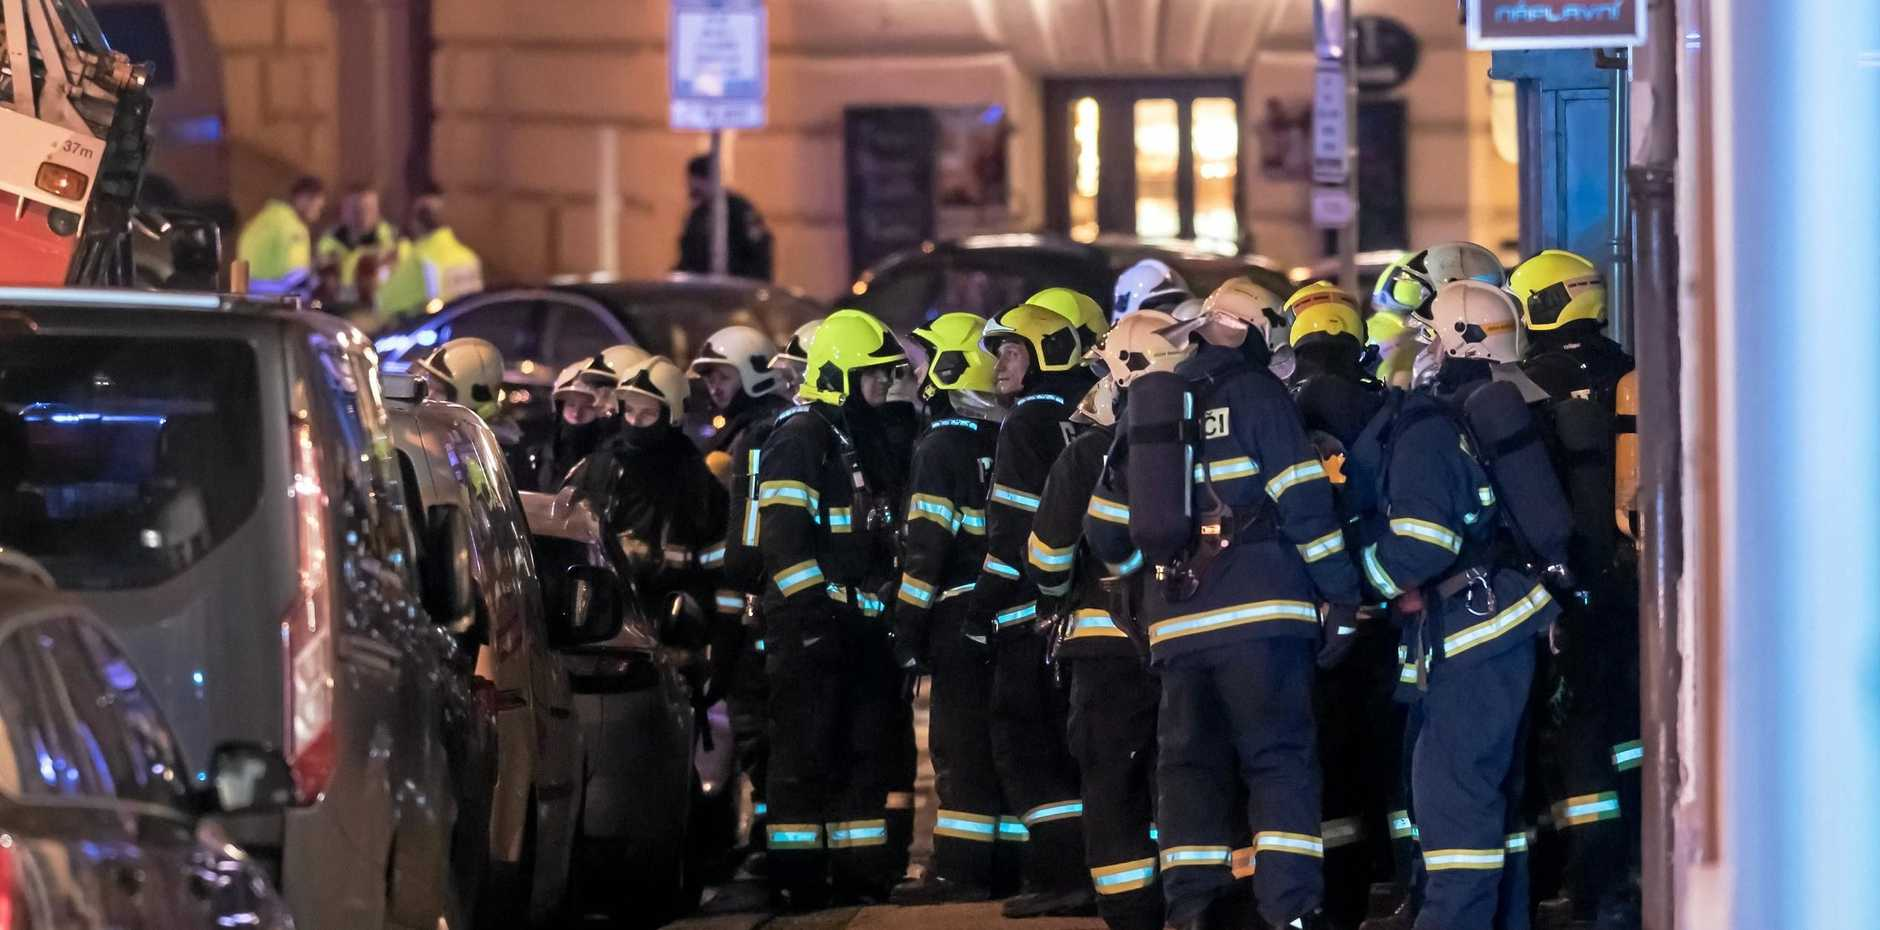 Firefighters prepare to enter the Eurostars David hotel in Prague, Czech Republic.